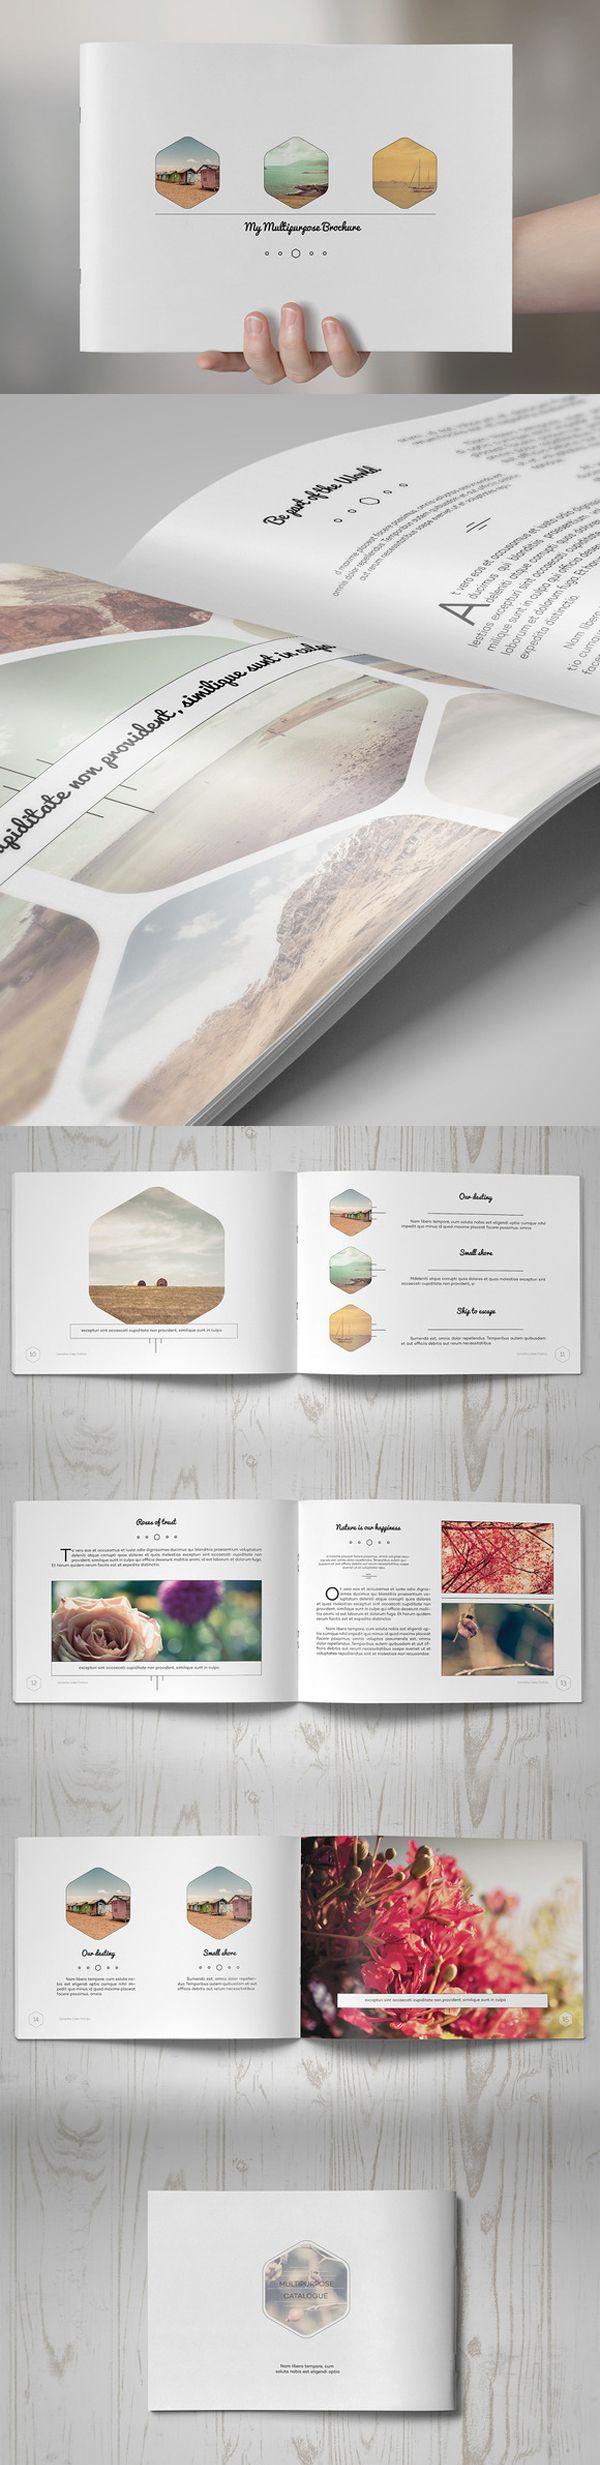 Multipurpose Clean Brochure Free Download